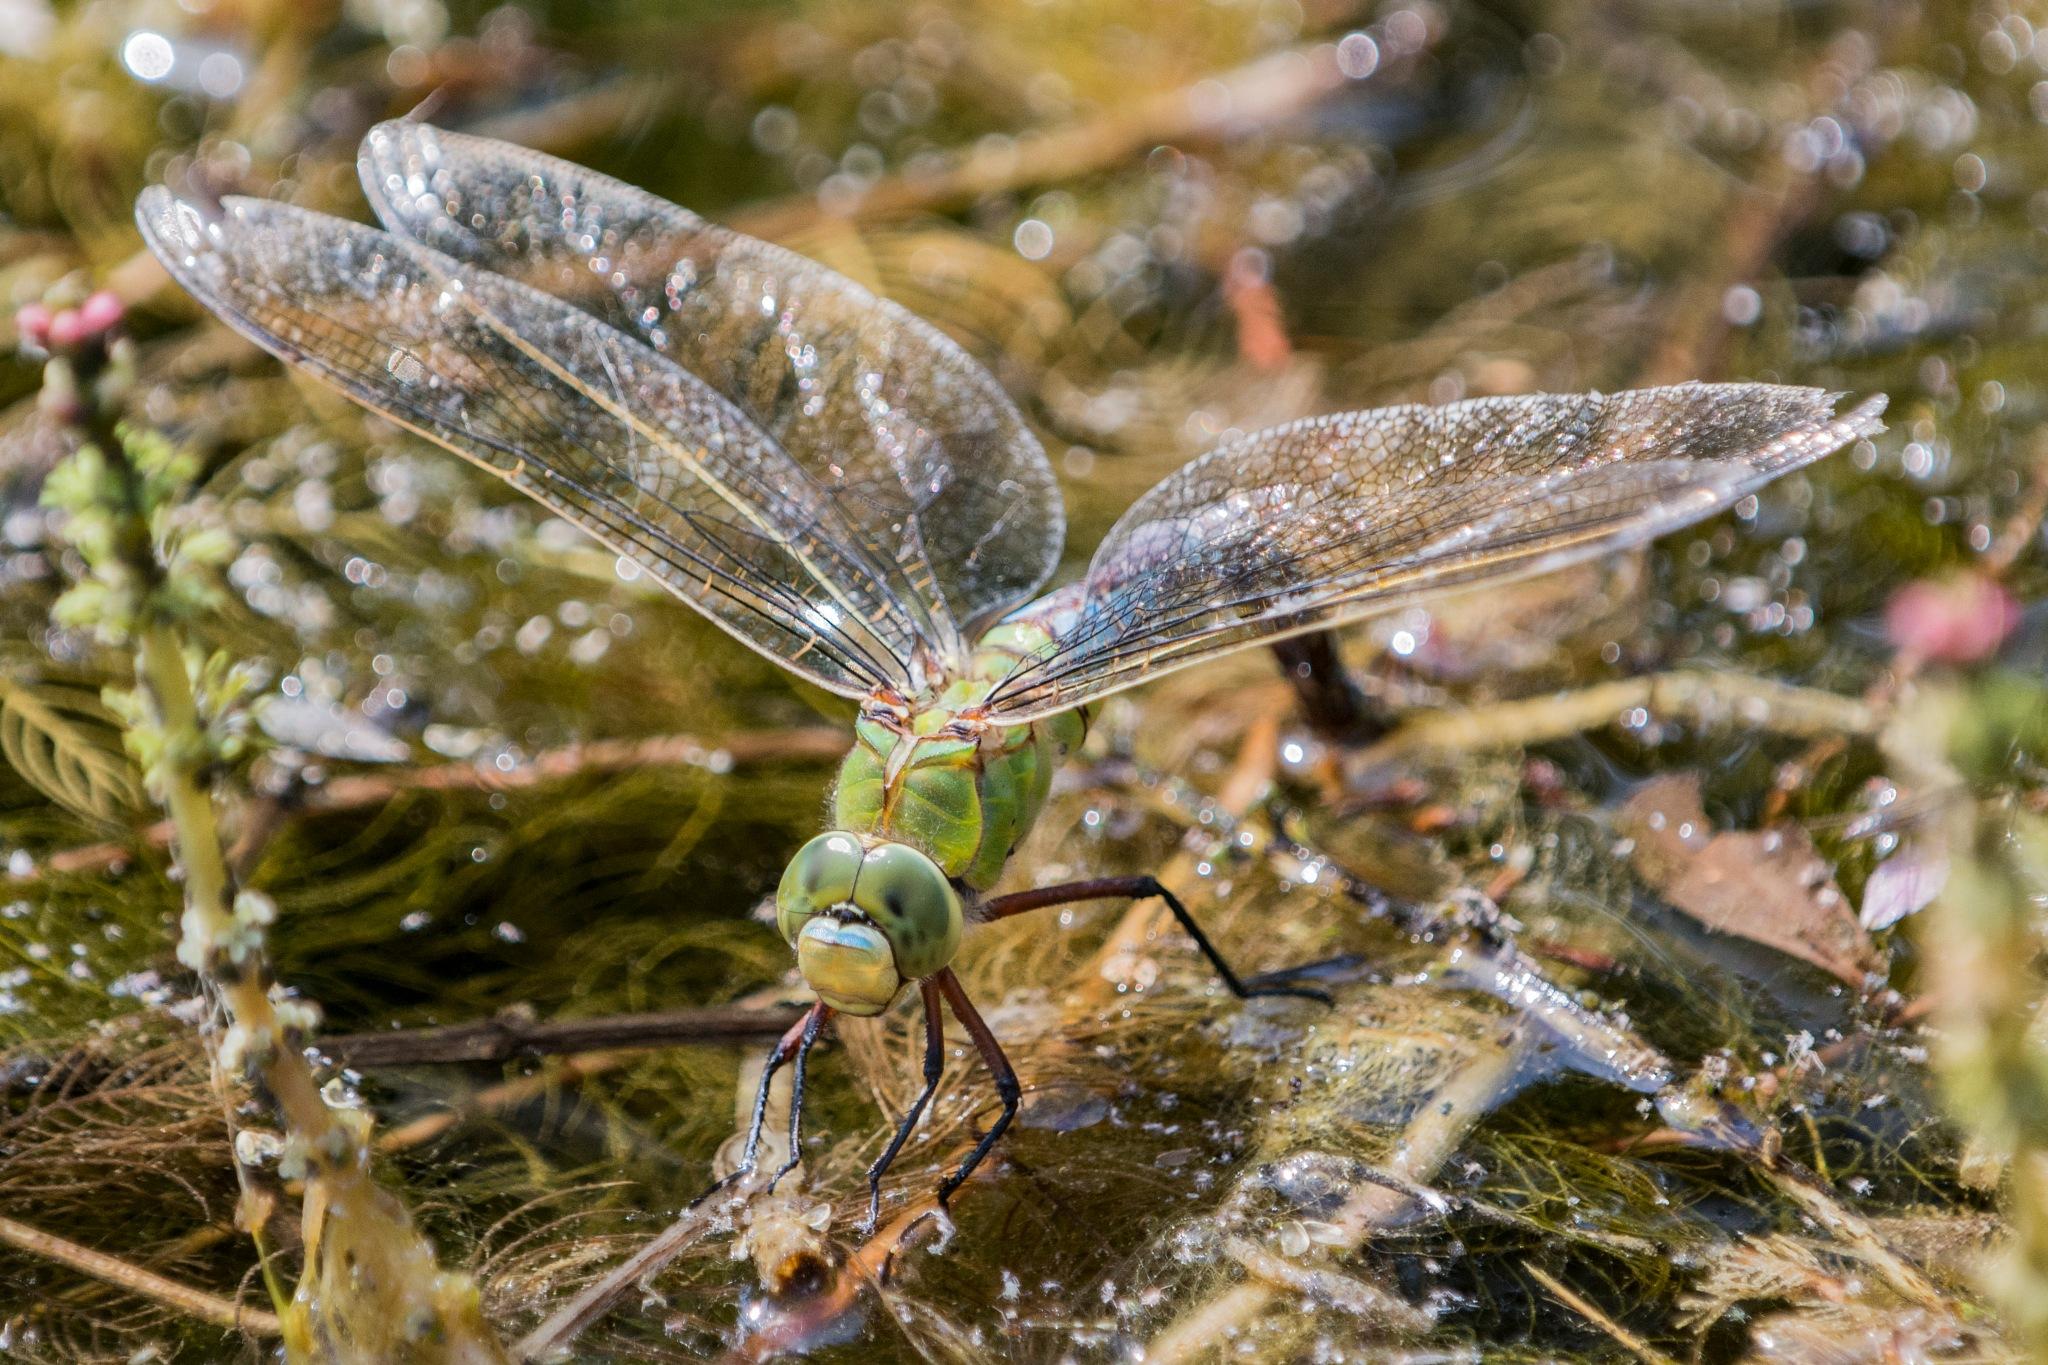 Dragonfly laying eggs by Ruud van Leeuwen